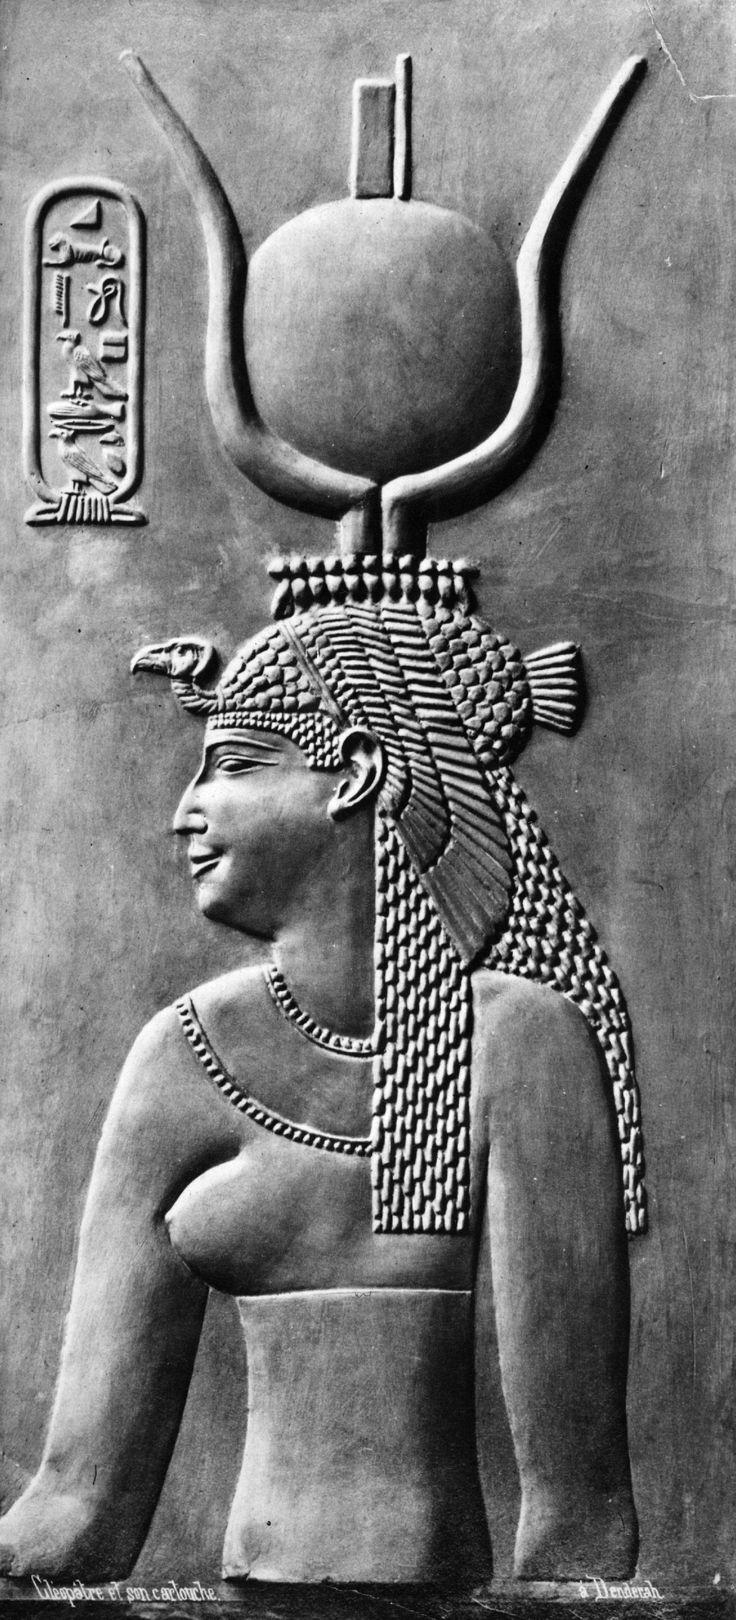 Cleopatra (69BC-30BC) Pharaoh of Ancient Egypt